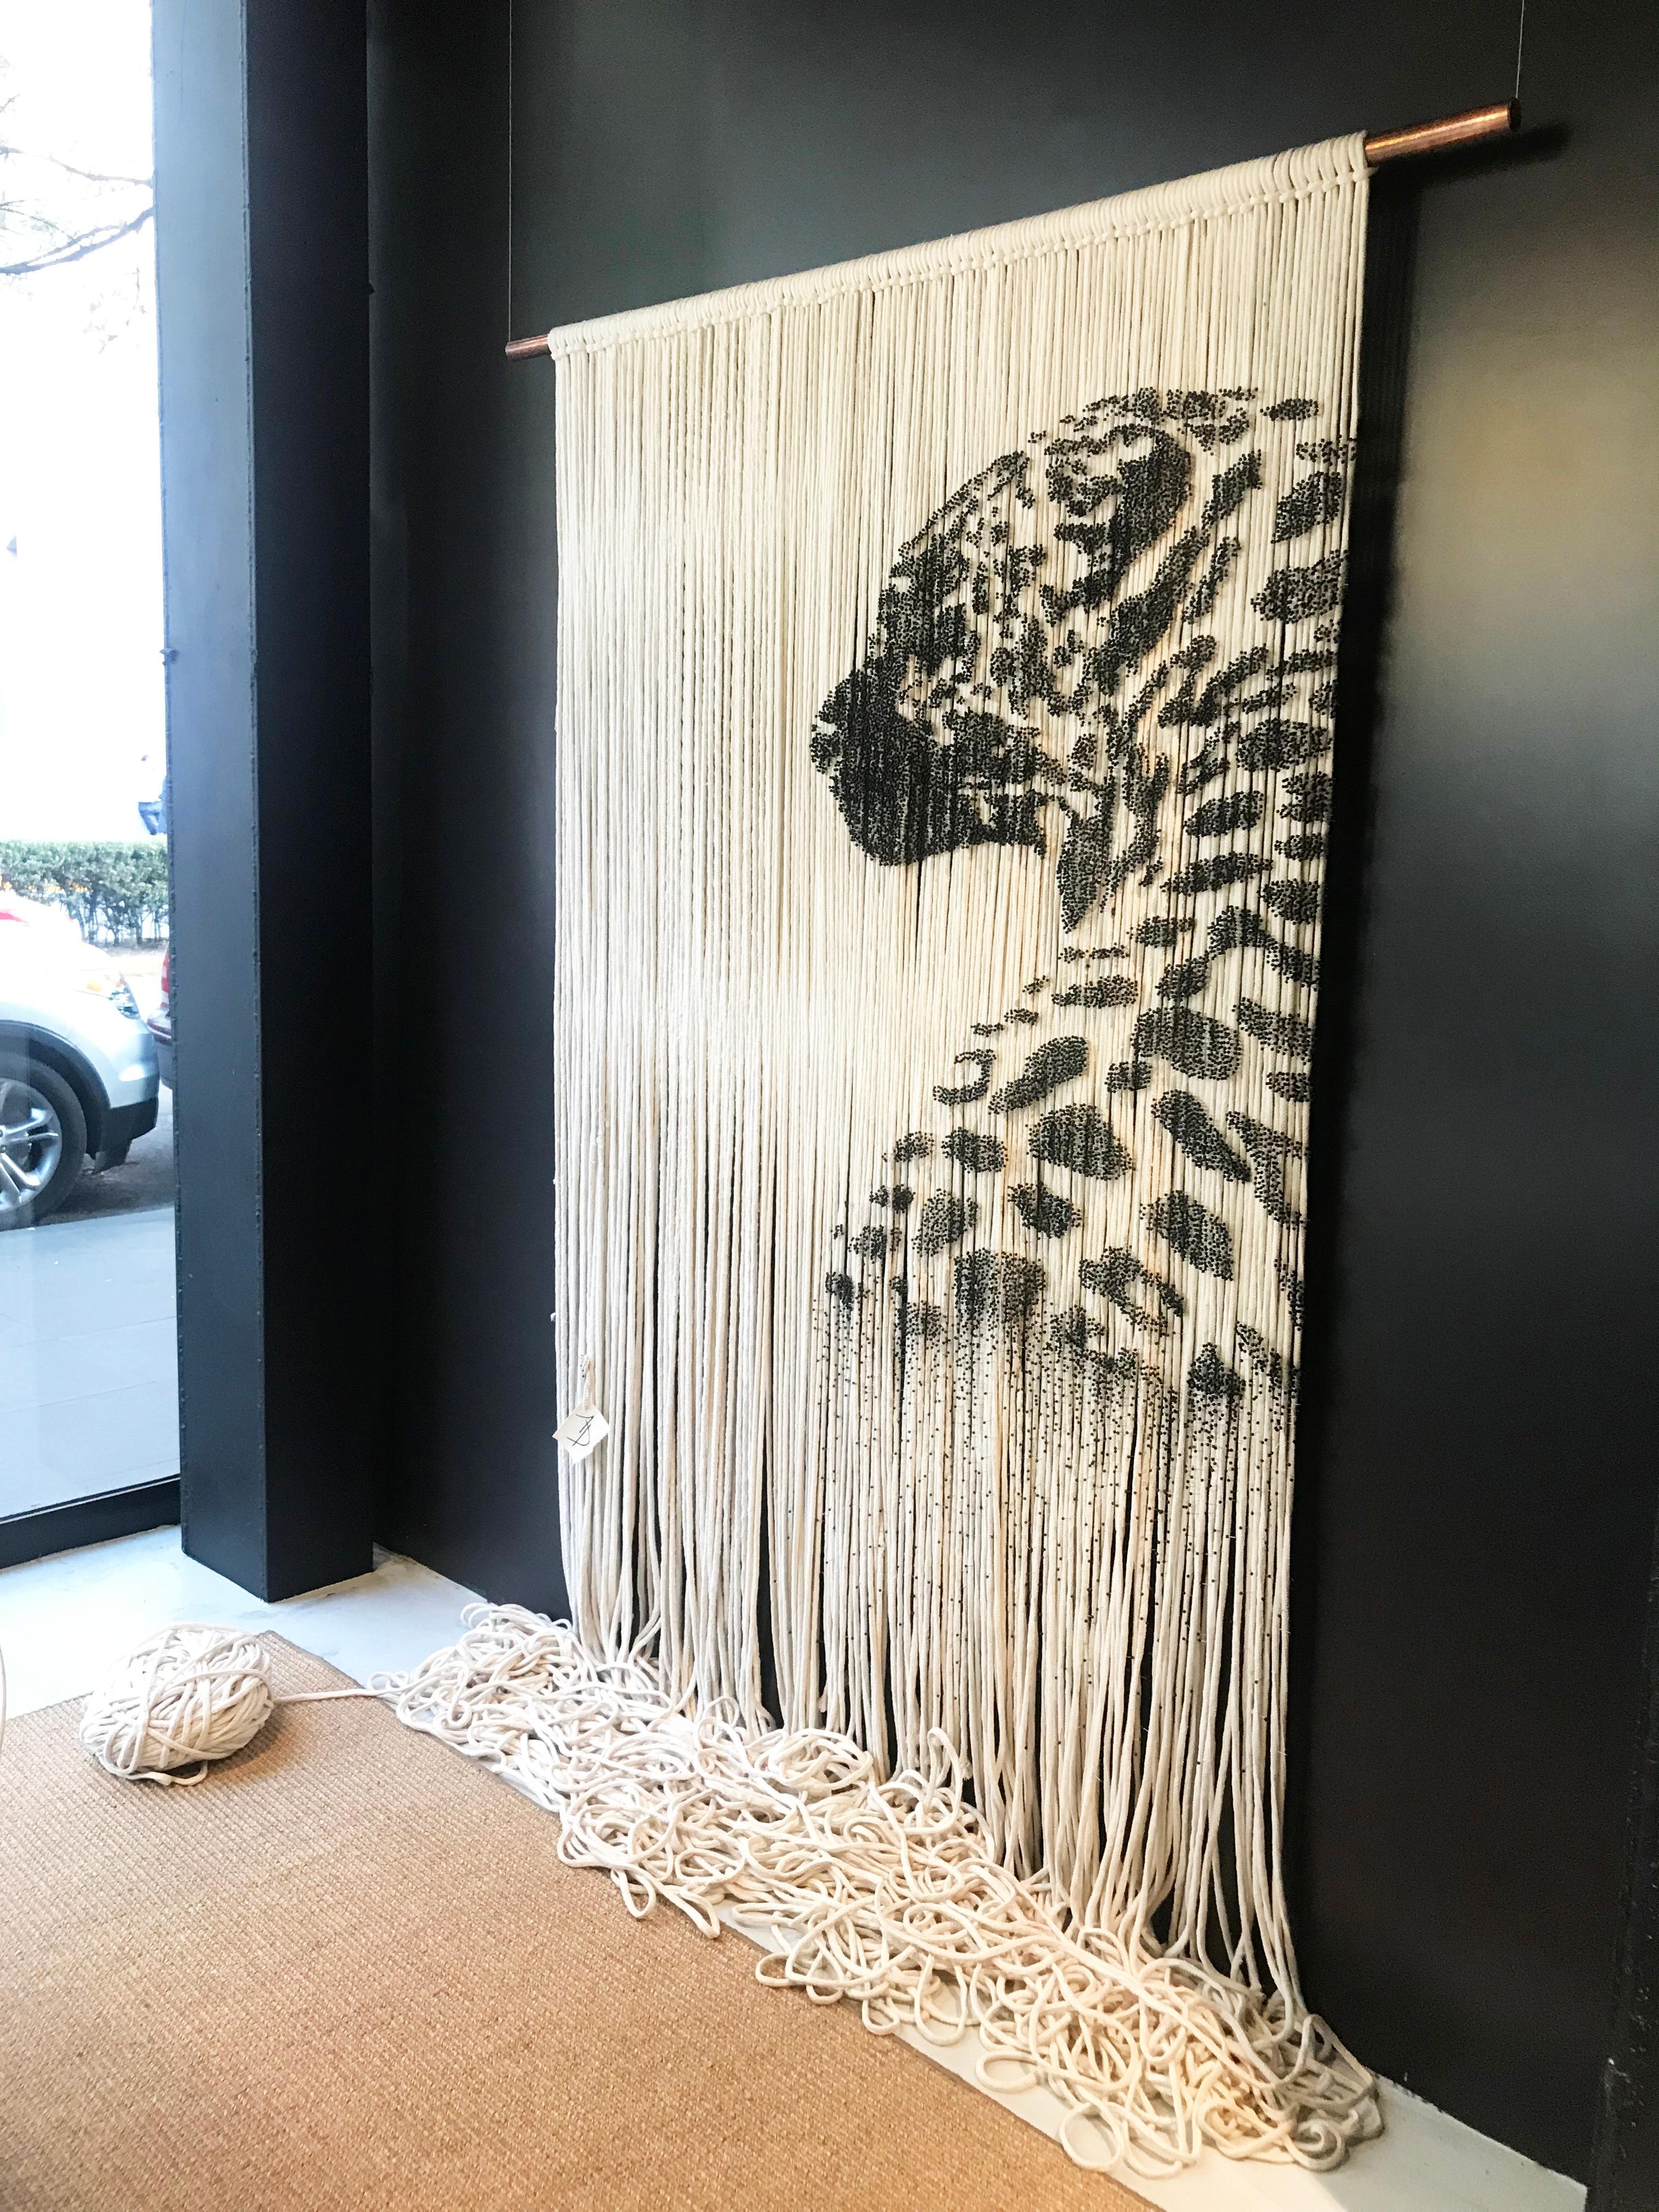 JAGUAR. animal sculptures. 3d